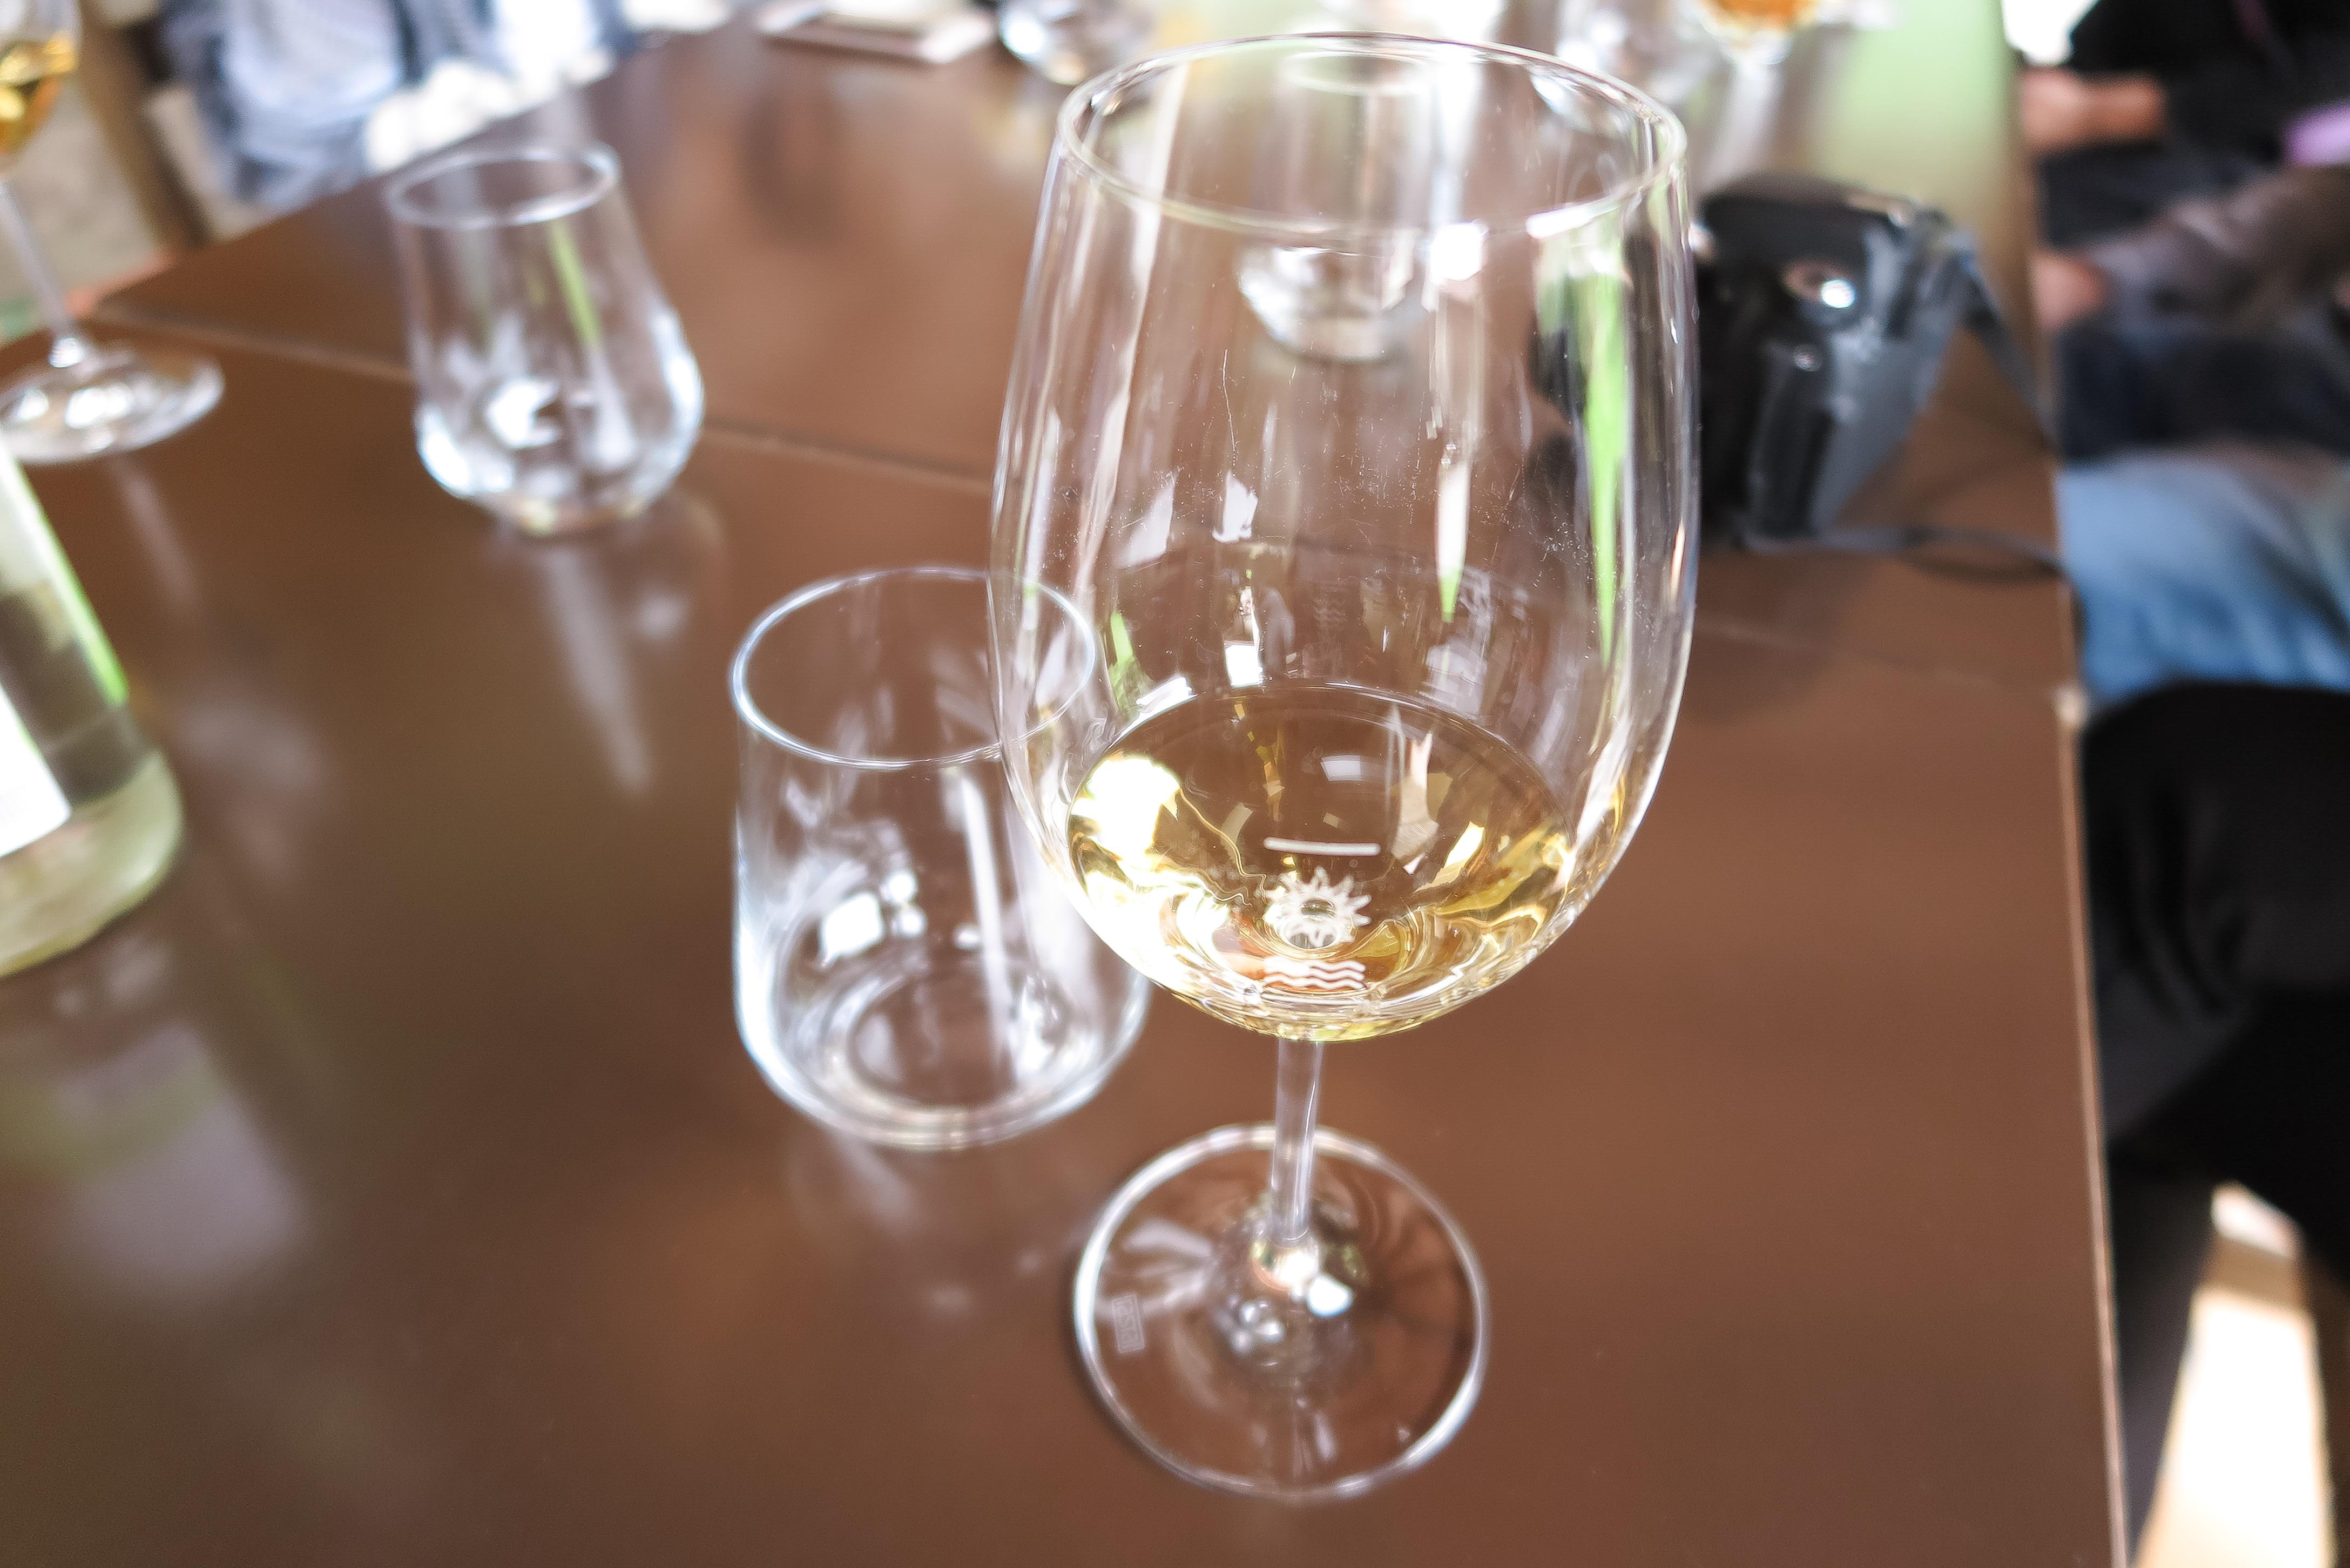 vino, vino italiana, italian whine, vino blanco, gino pedrotti azienda agricola, italia, trentino, expo riva schuh 86, cristina blanco, guiadeestilo. nosiola, vino santo, laura, lauro